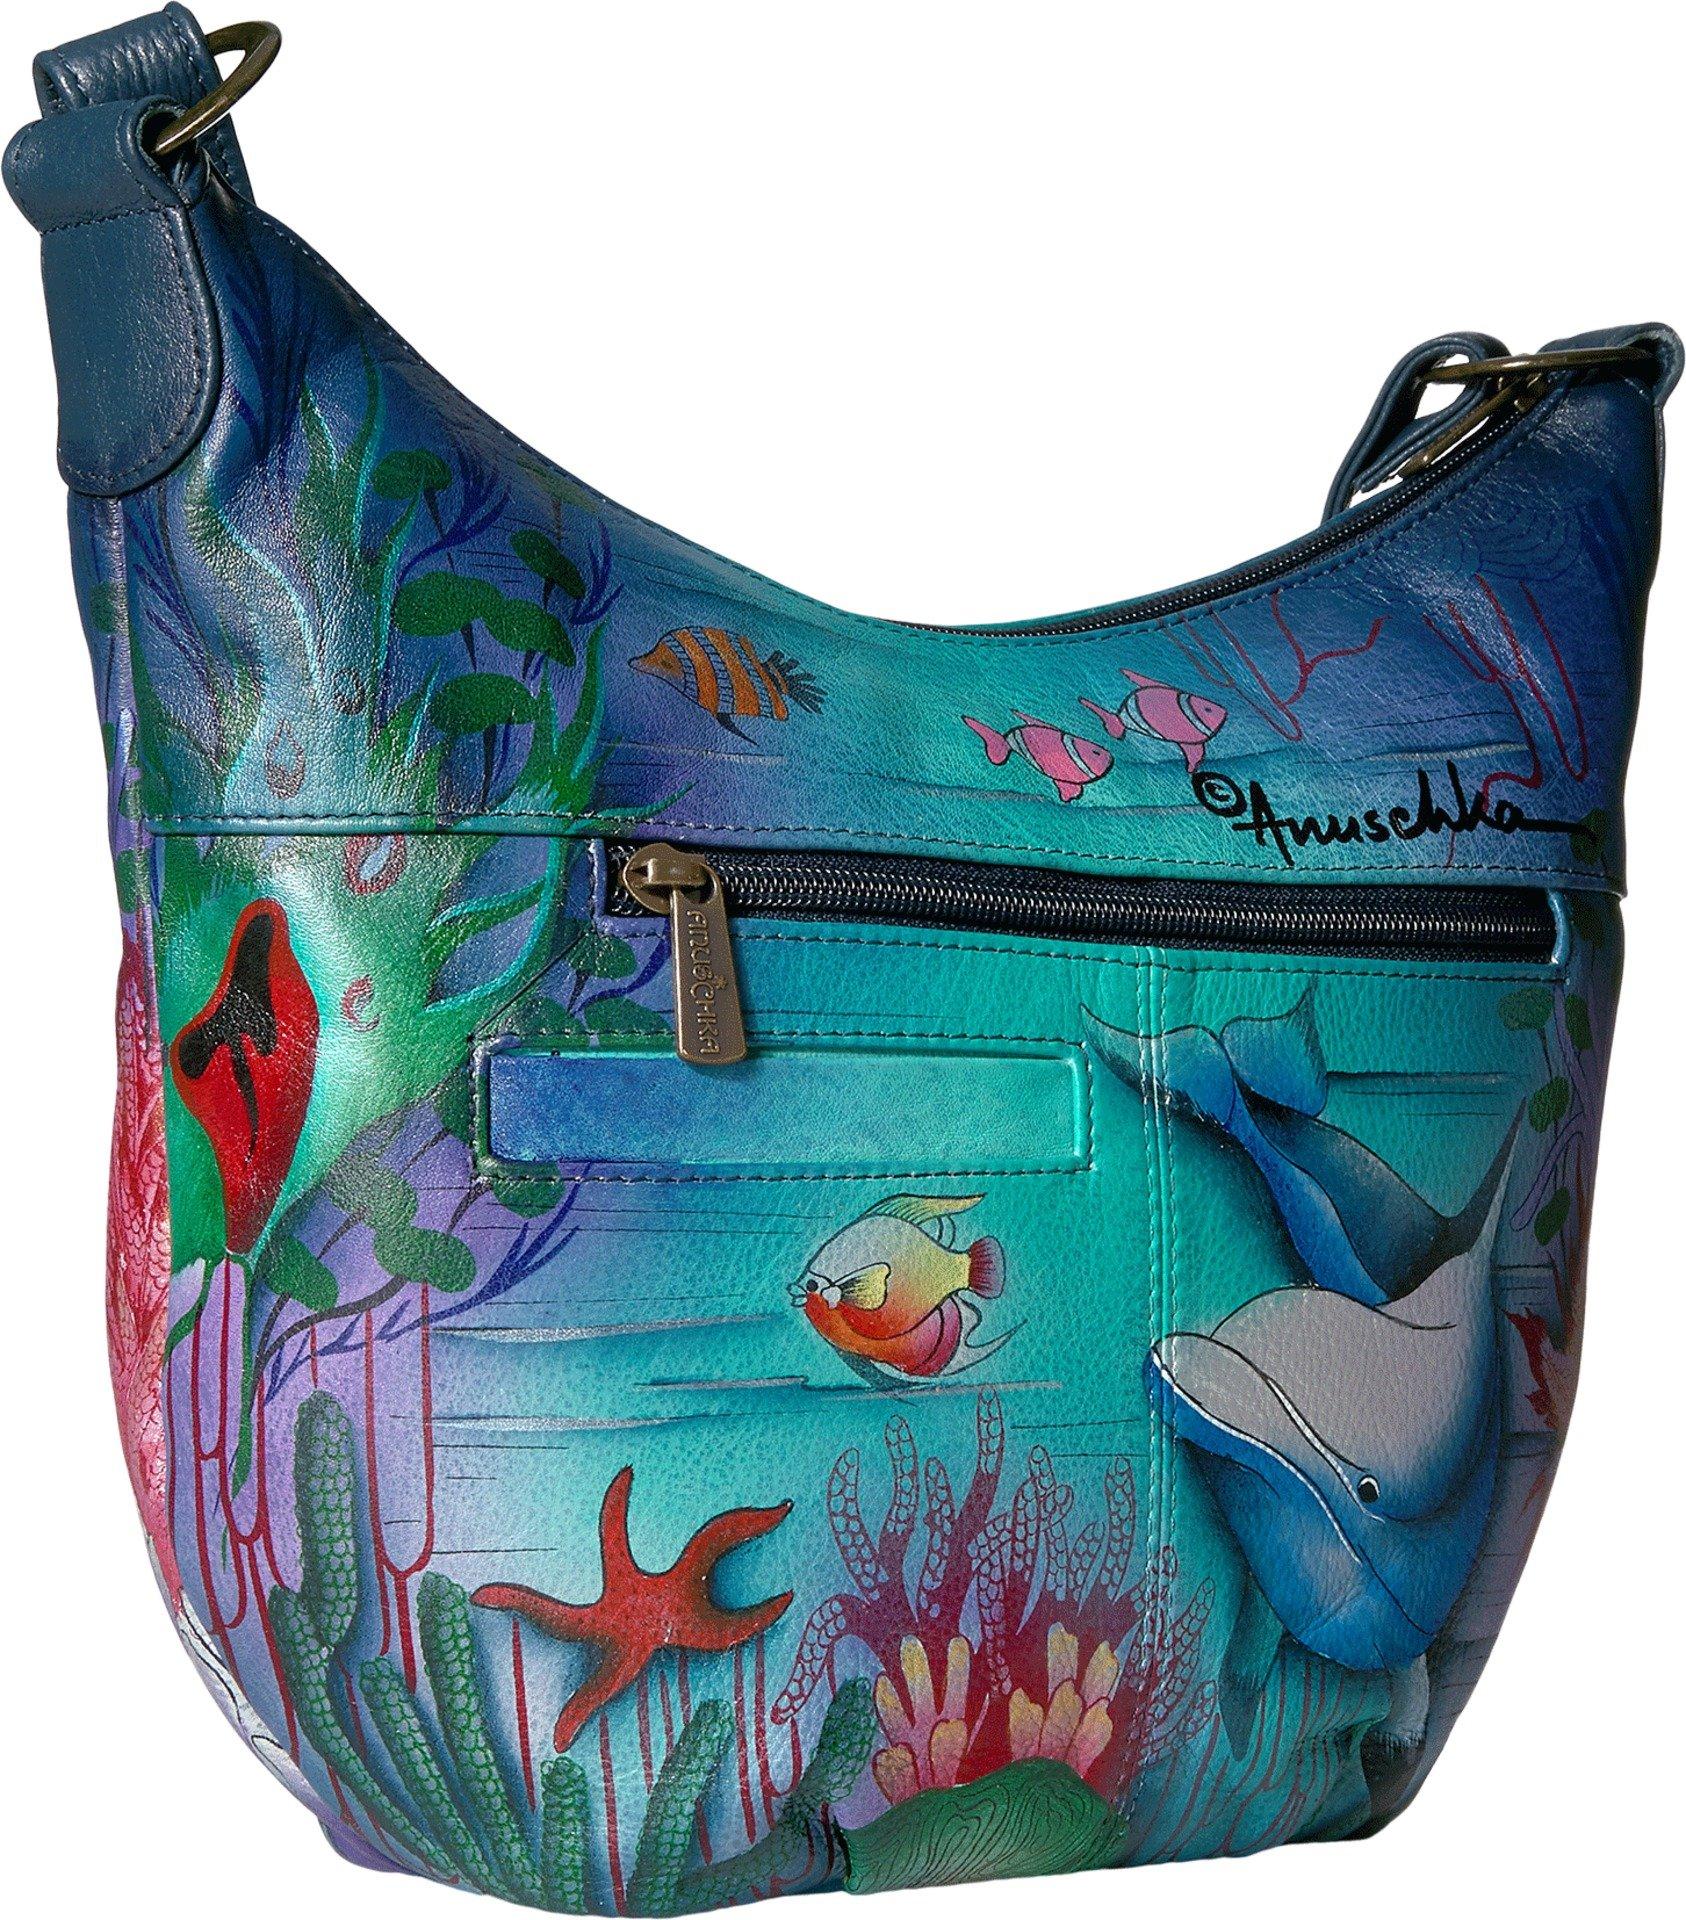 Anuschka Medium Bucket Hobodolphin World, Dolphin World by ANUSCHKA (Image #2)